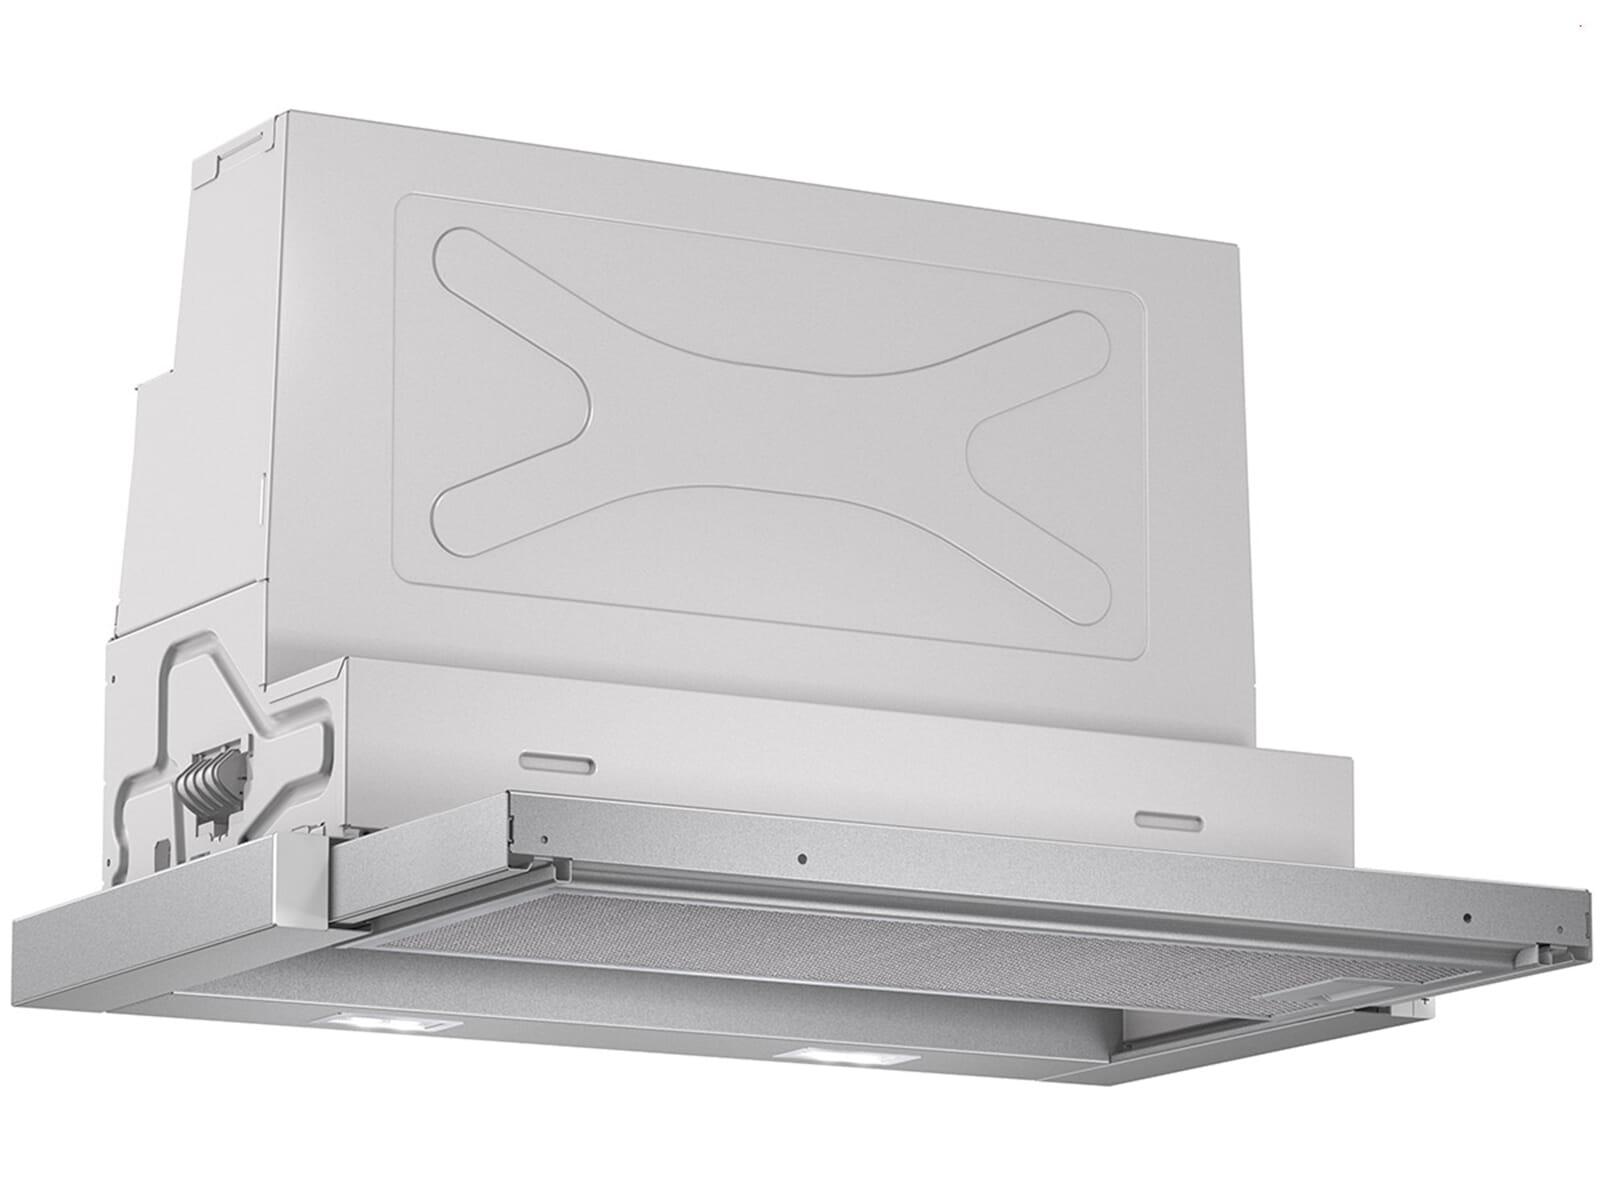 Bosch dfr a flachschirmhaube grau metallic